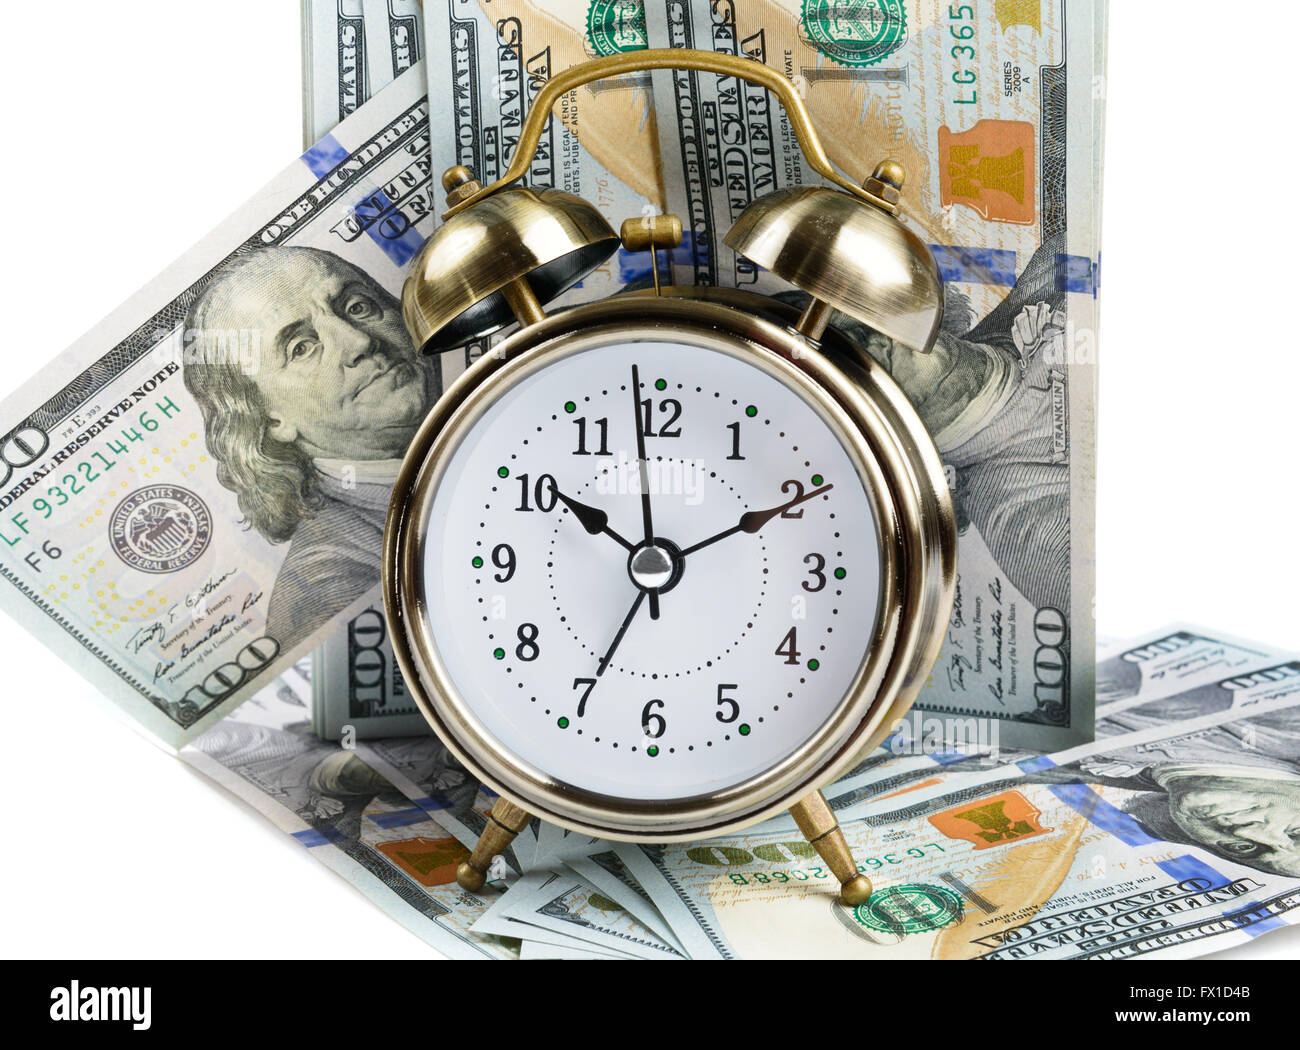 Alarm clock and dollar banknotes - Stock Image